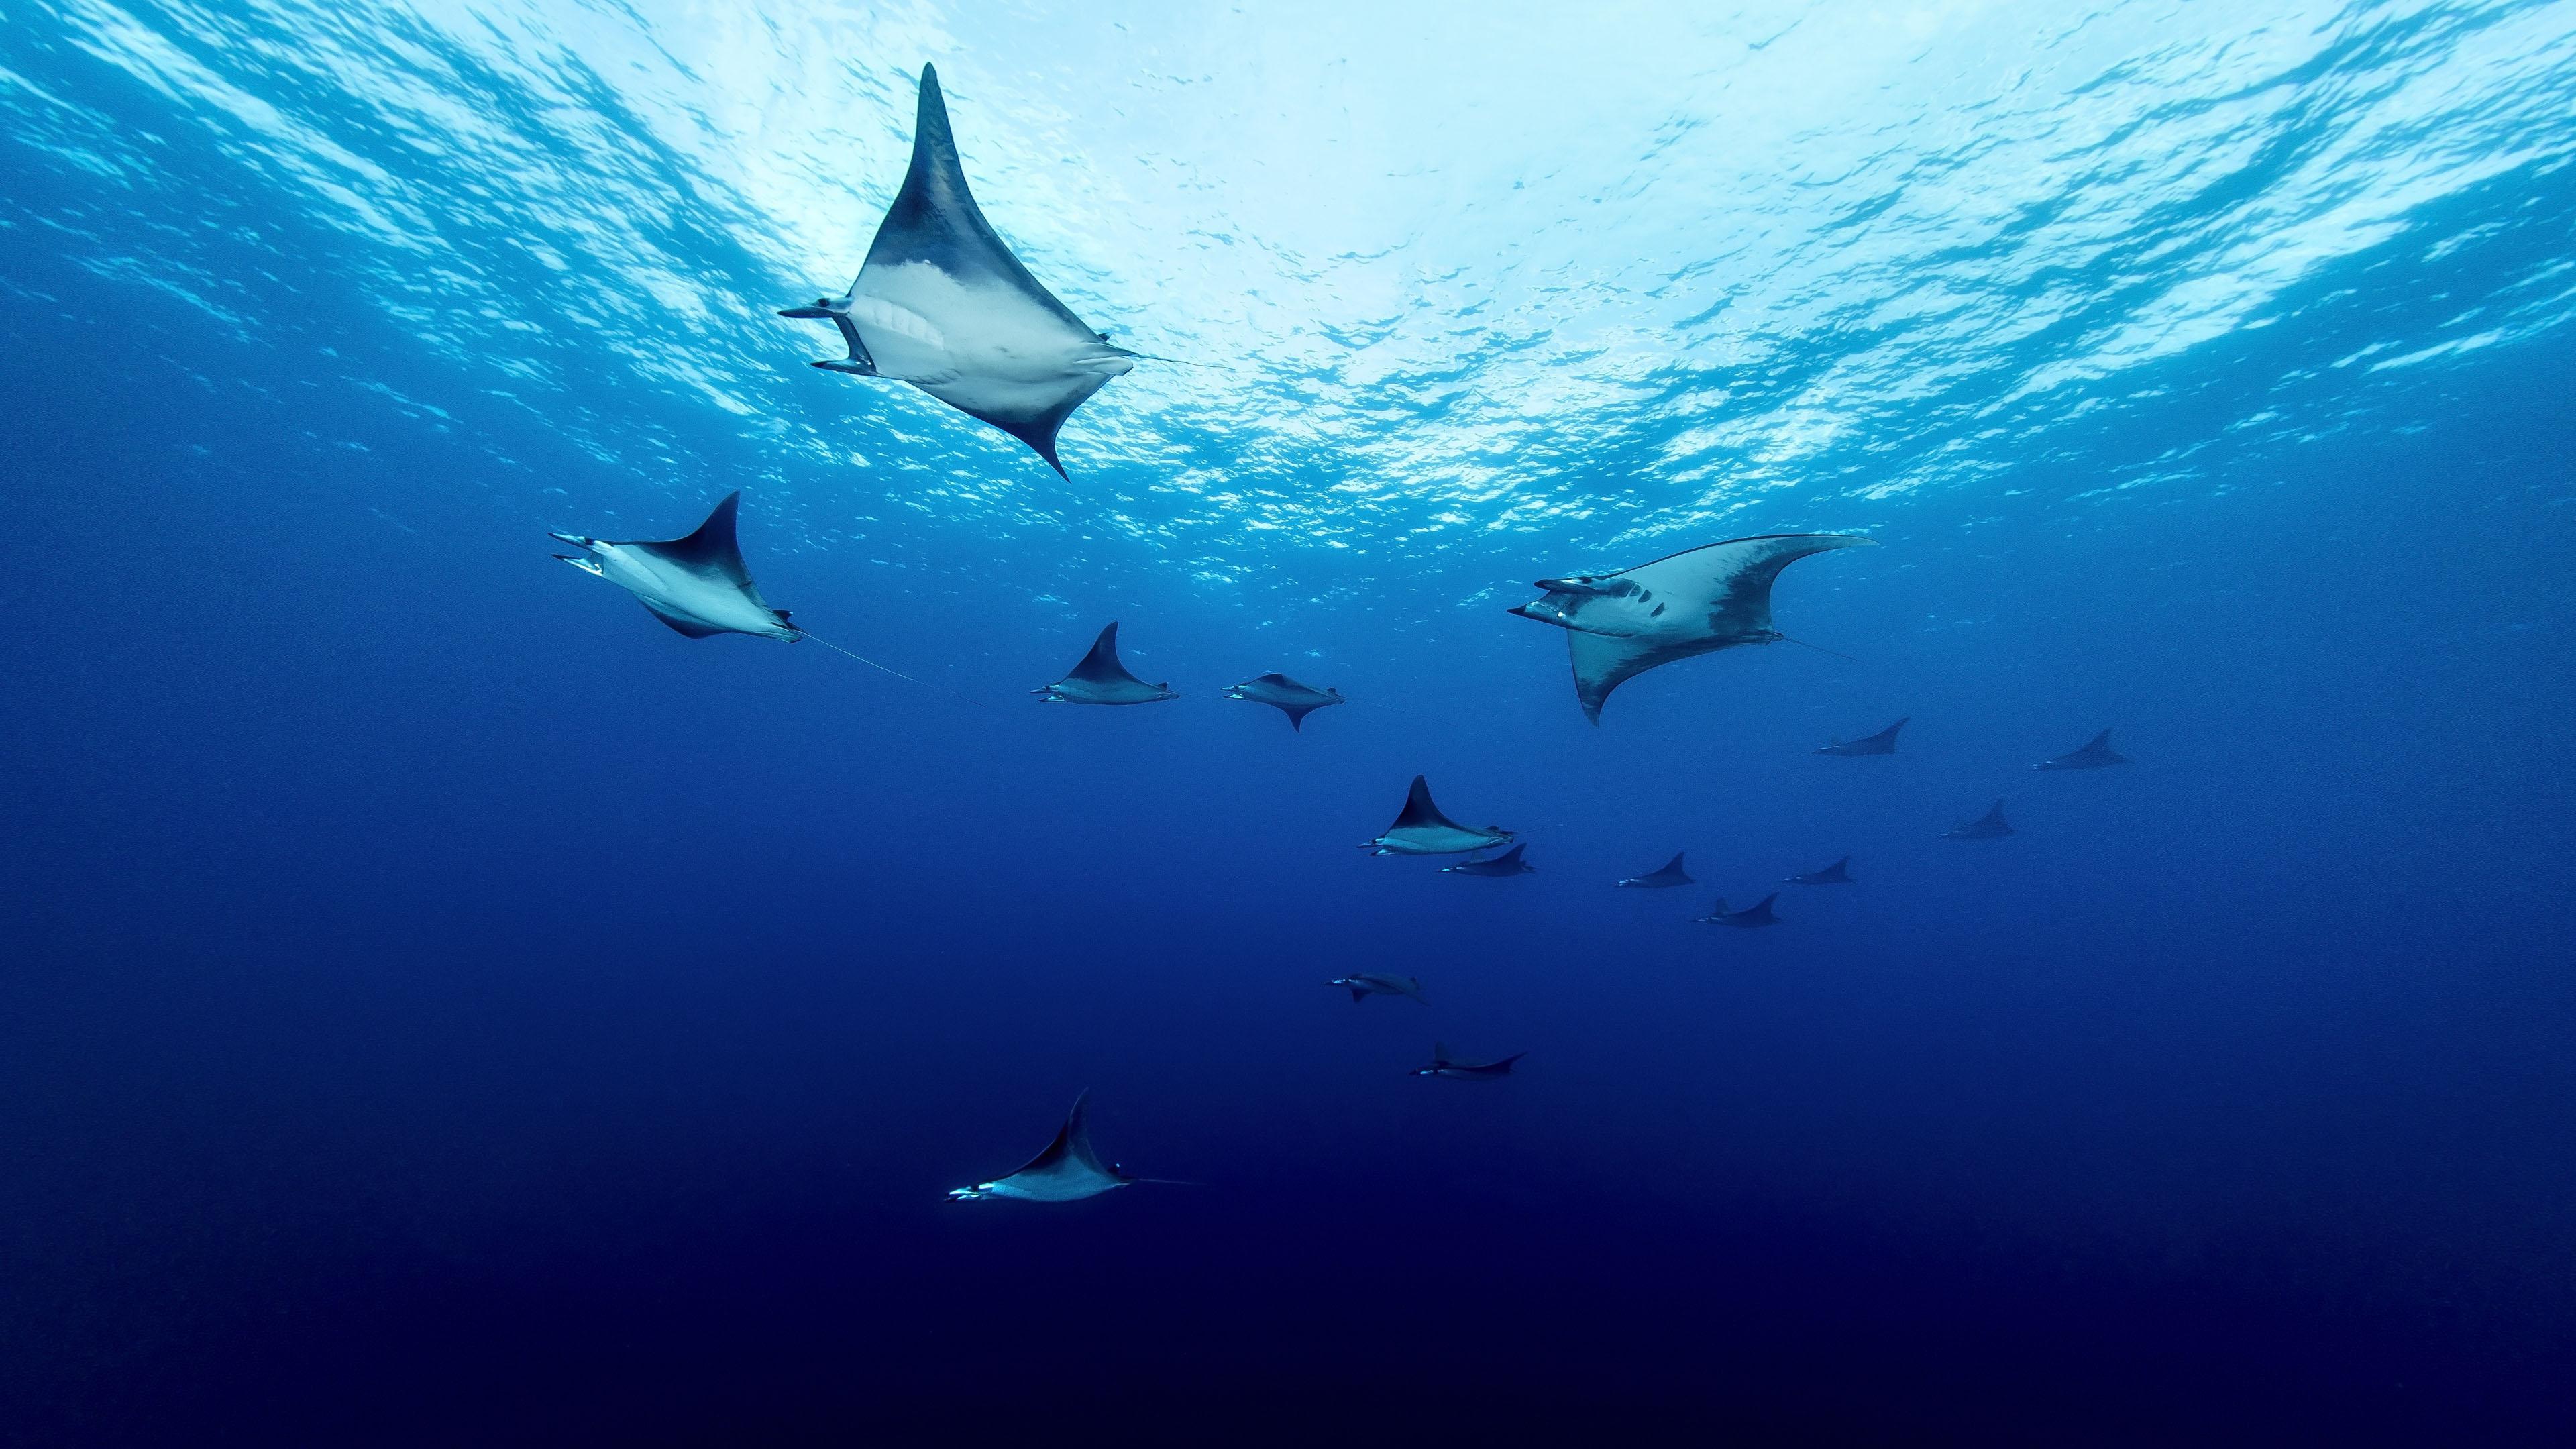 4K专区,海底世界,海洋,深海,莫布拉雷